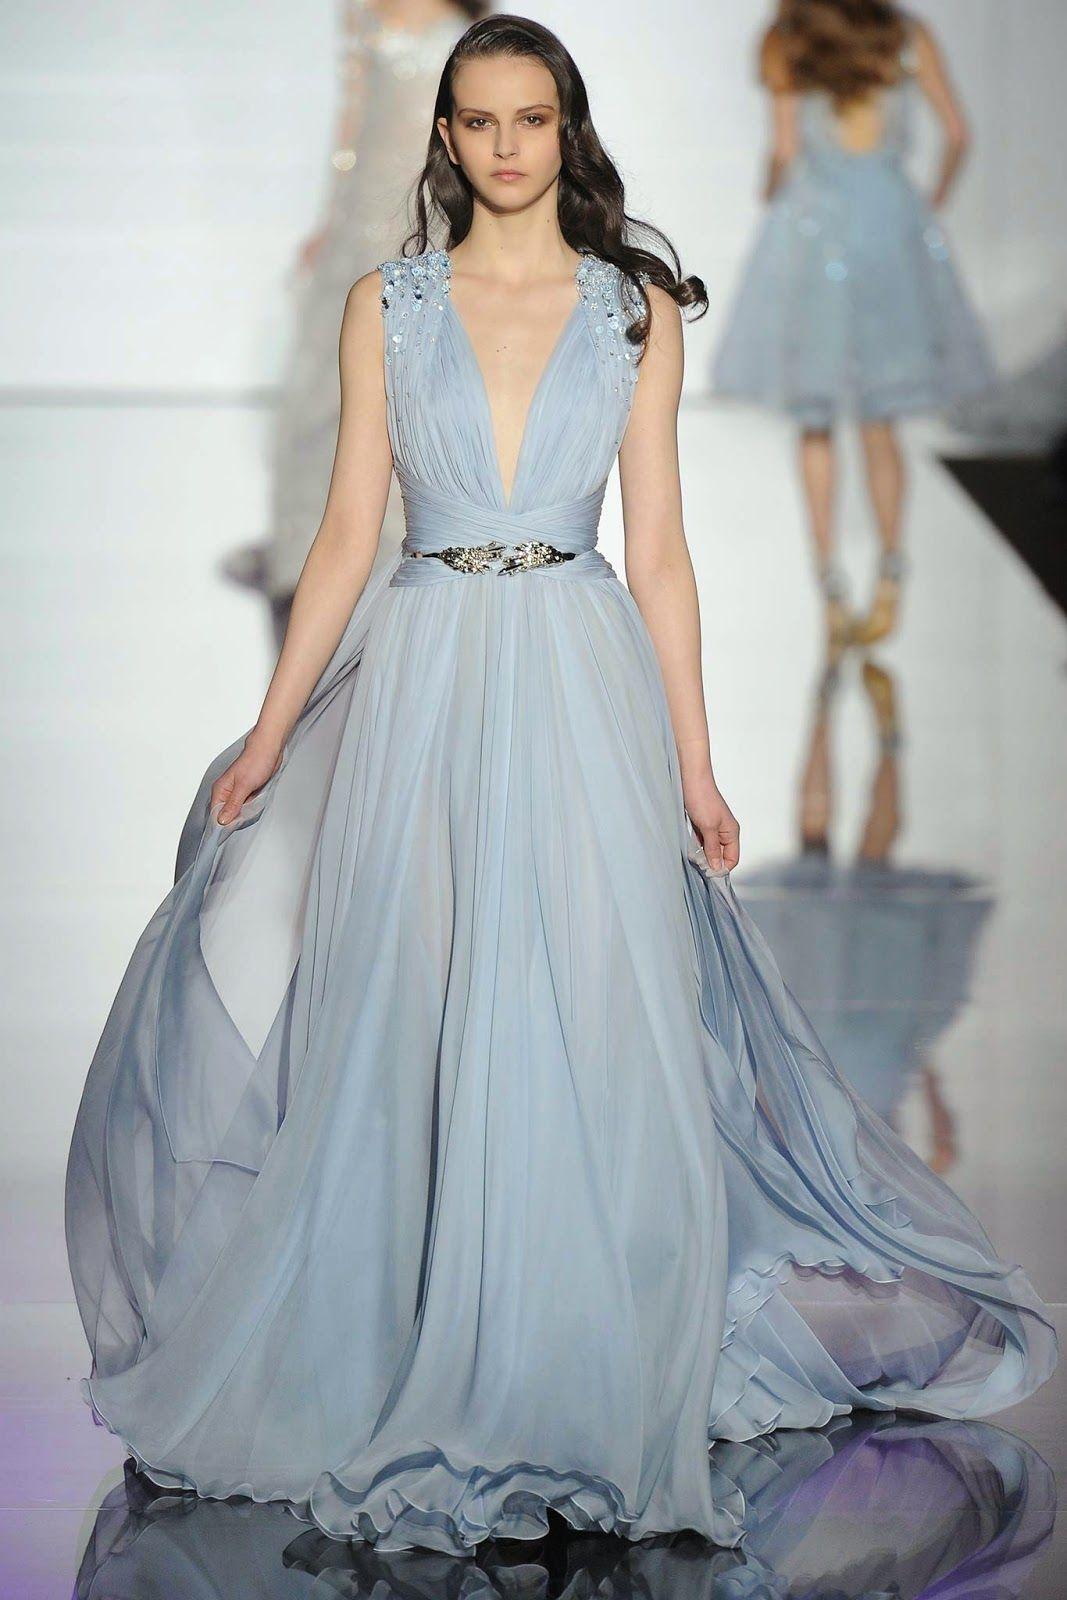 Zuhair Murad: Vestidos de Princesa | Moda | Pinterest | Zuhair murad ...